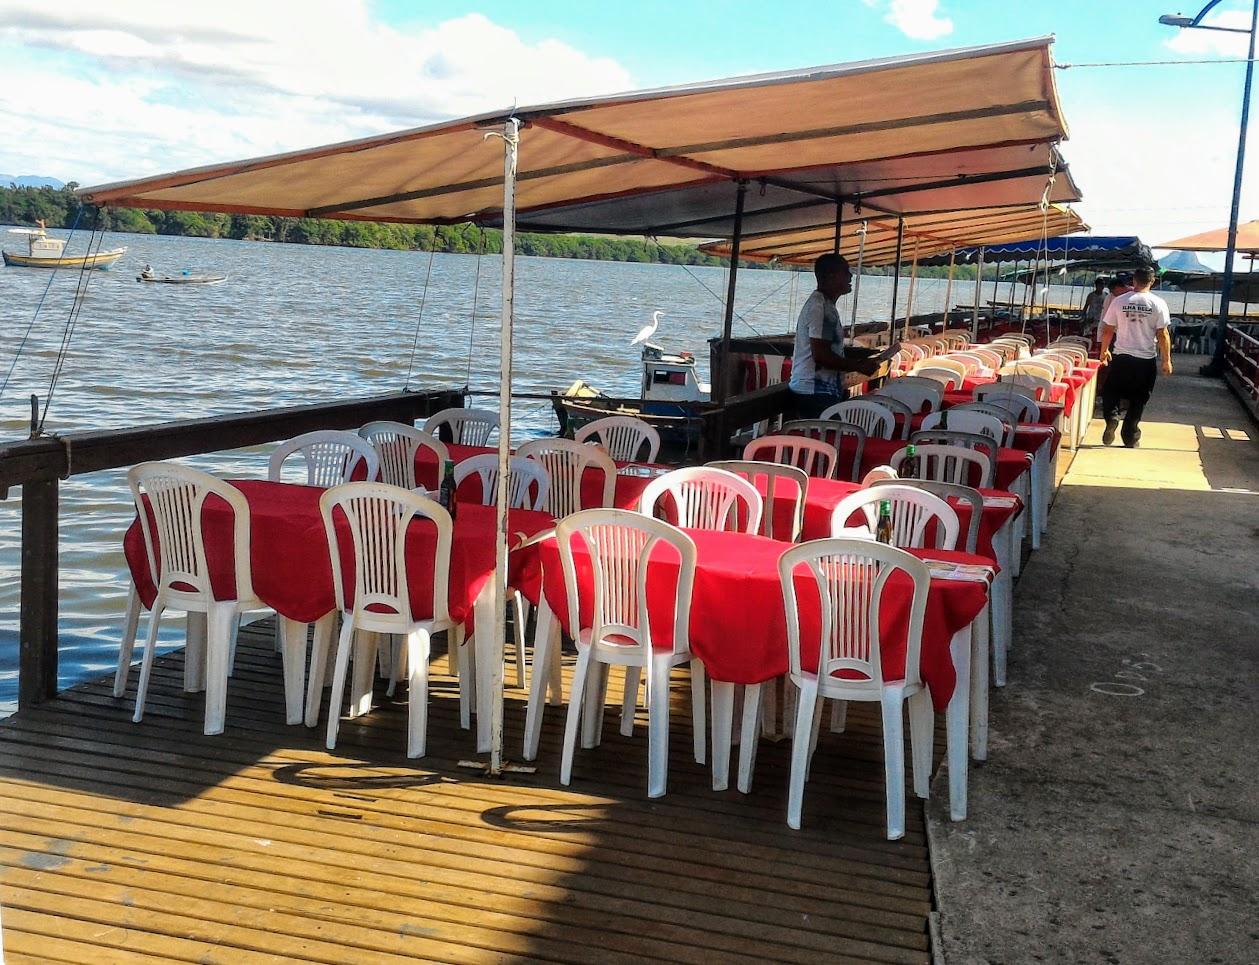 Mesas dos restaurantes da Ilha das Caieiras